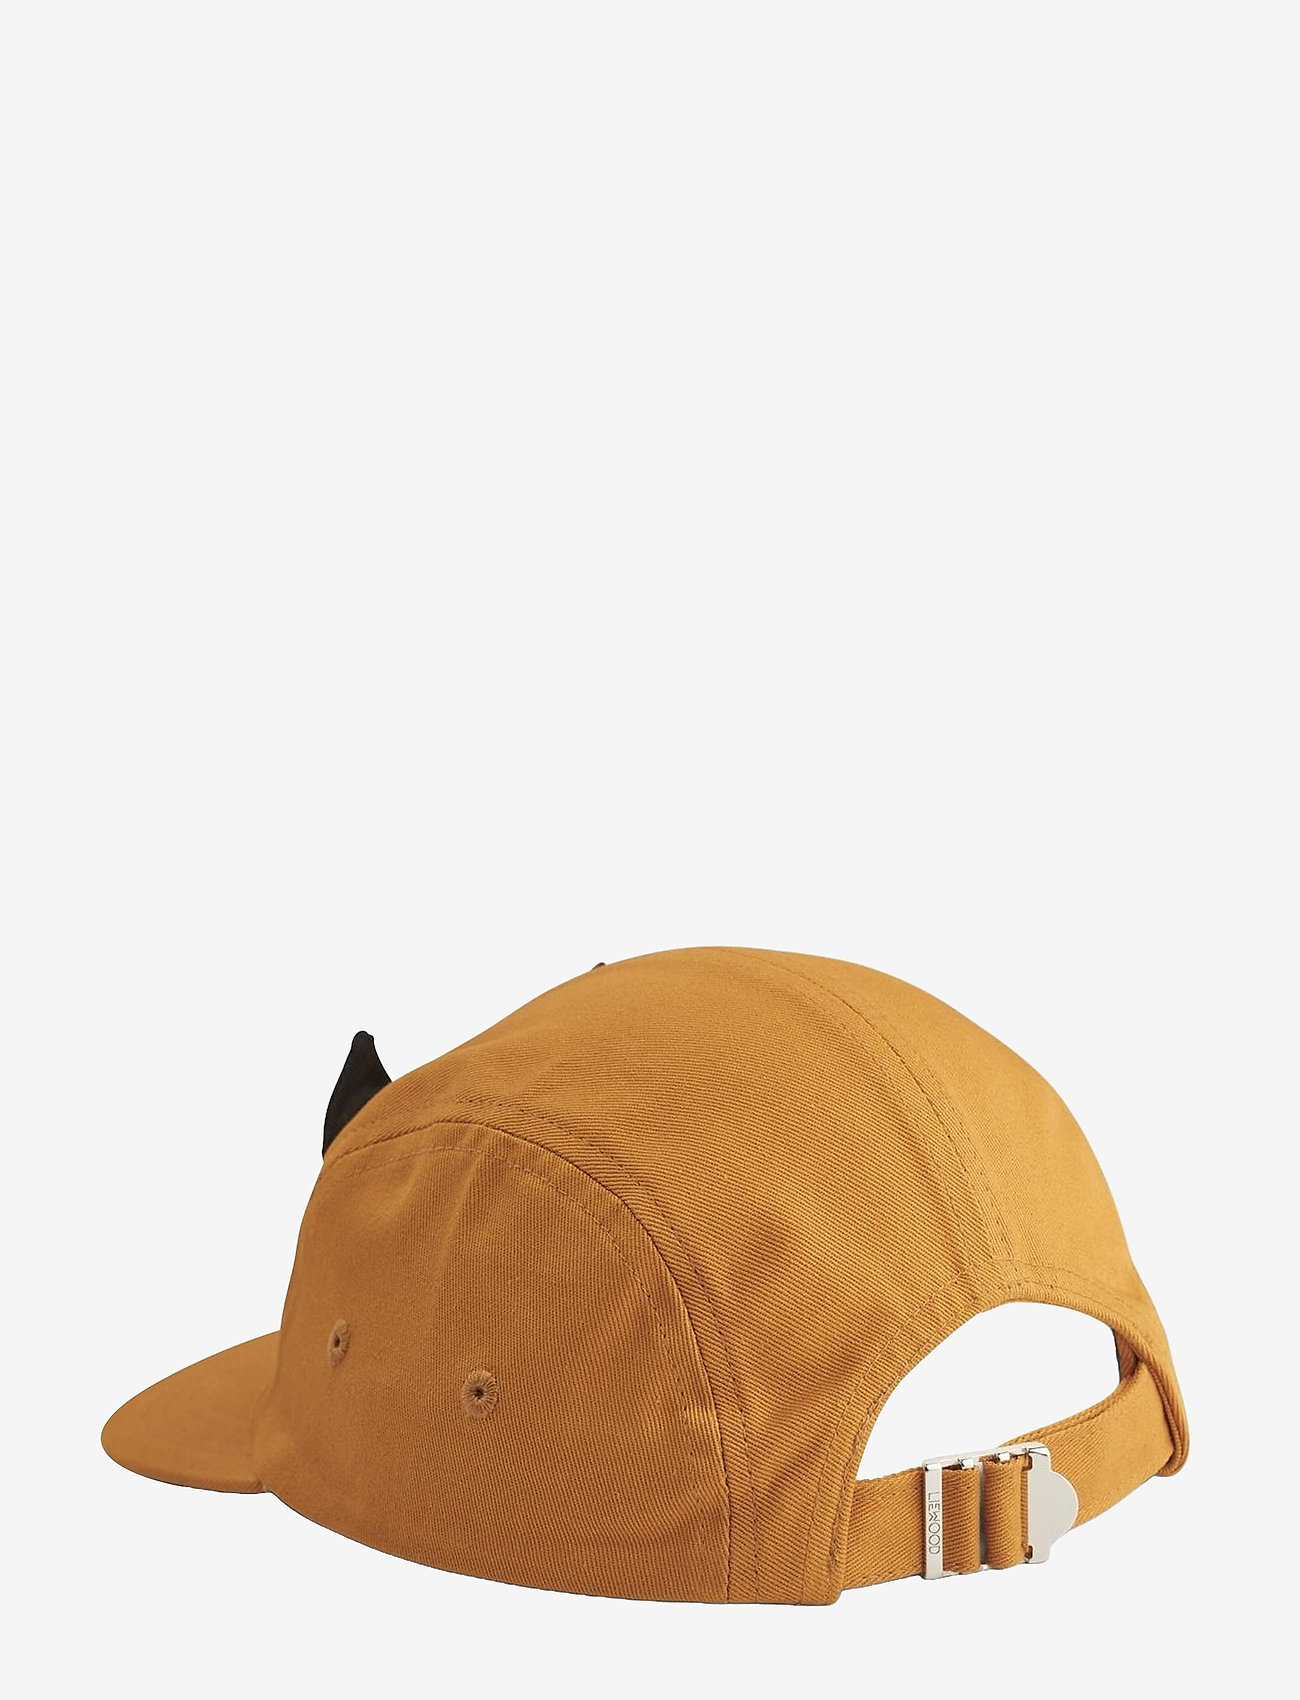 Liewood - Rory cap - mutsen - cat mustard - 1